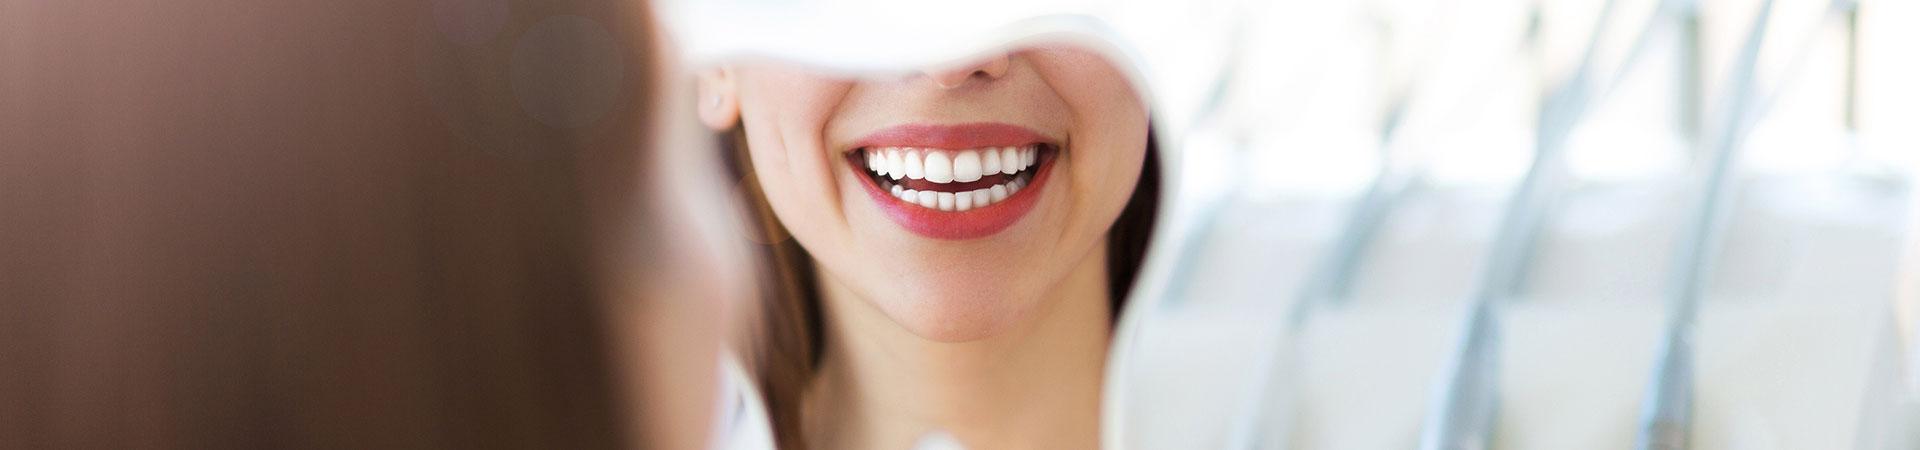 Woman looking at her beautiful teeth in a mirror. Oral hygiene Marietta, GA.